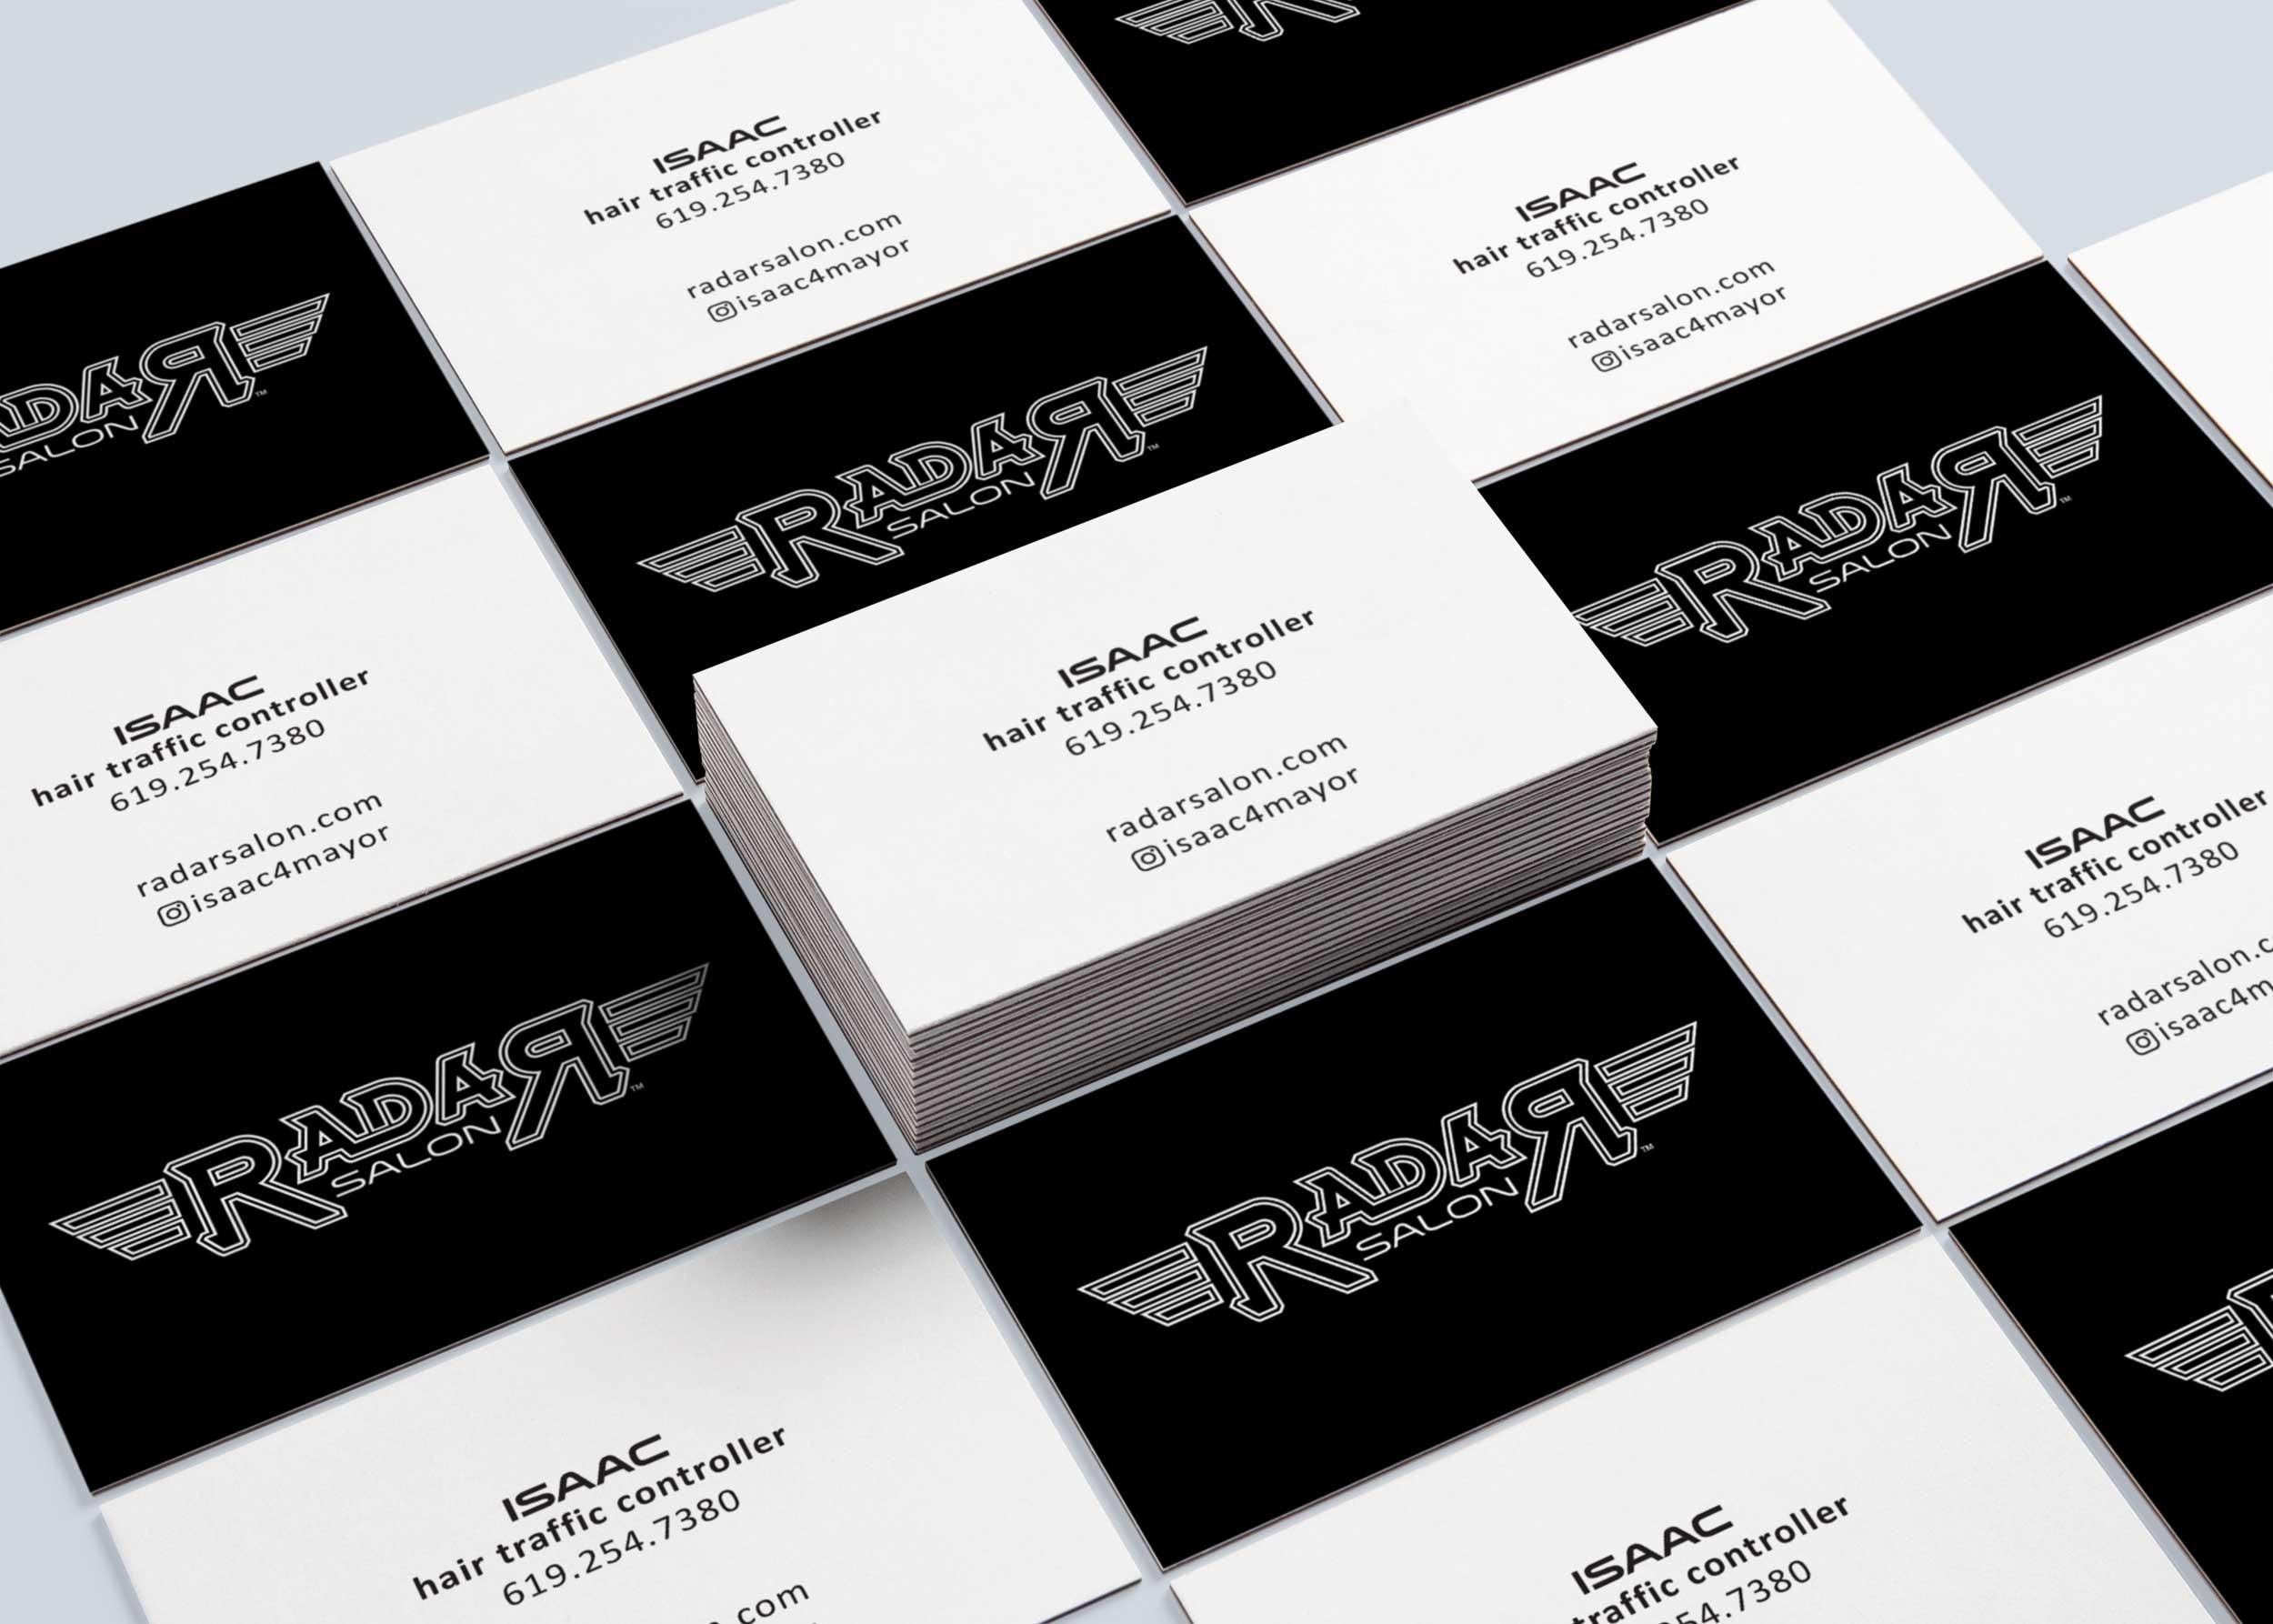 Radar Salon Business Cards